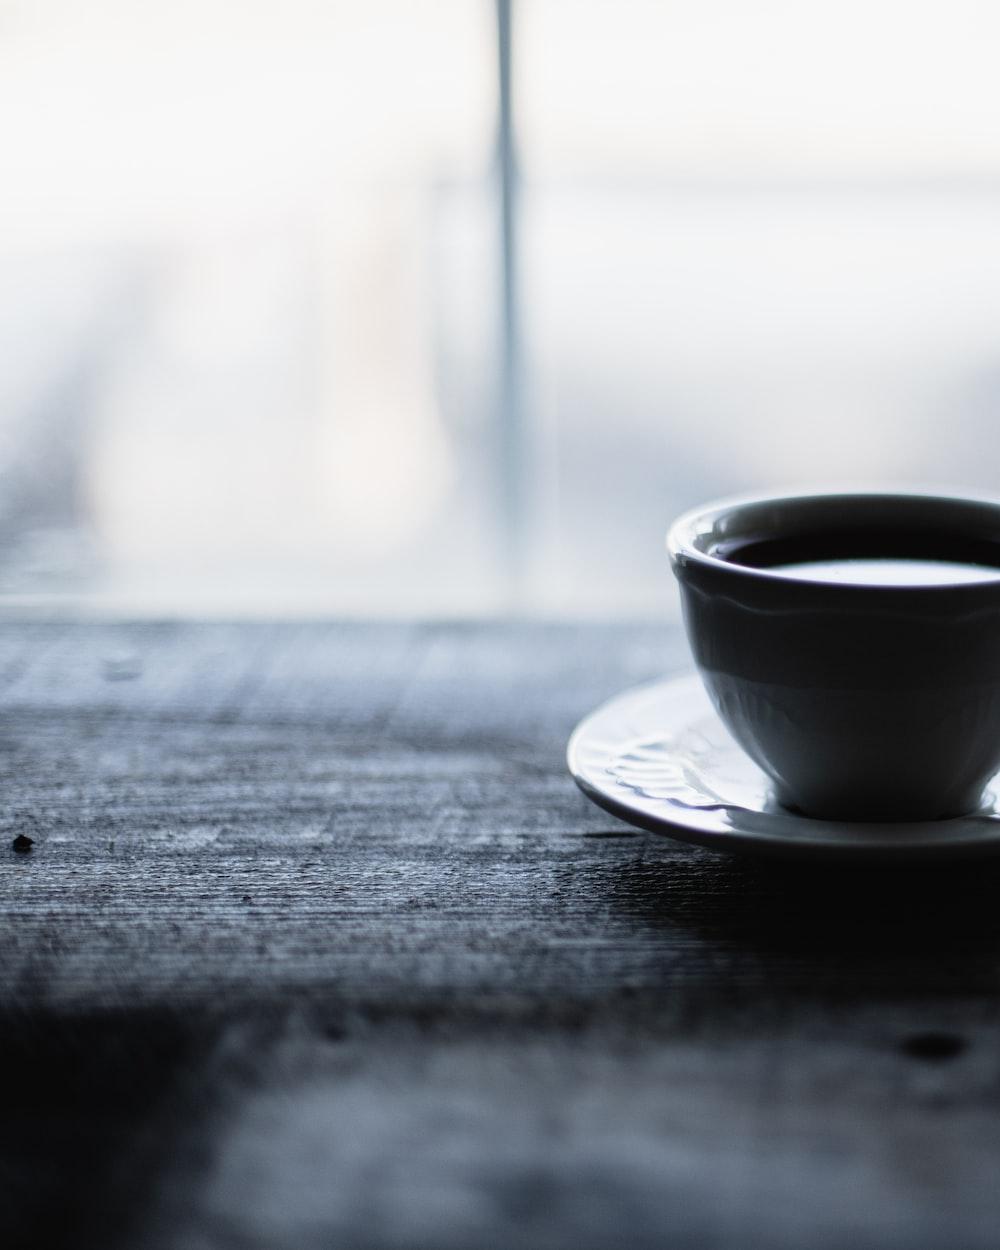 grayscale photo of ceramic mug